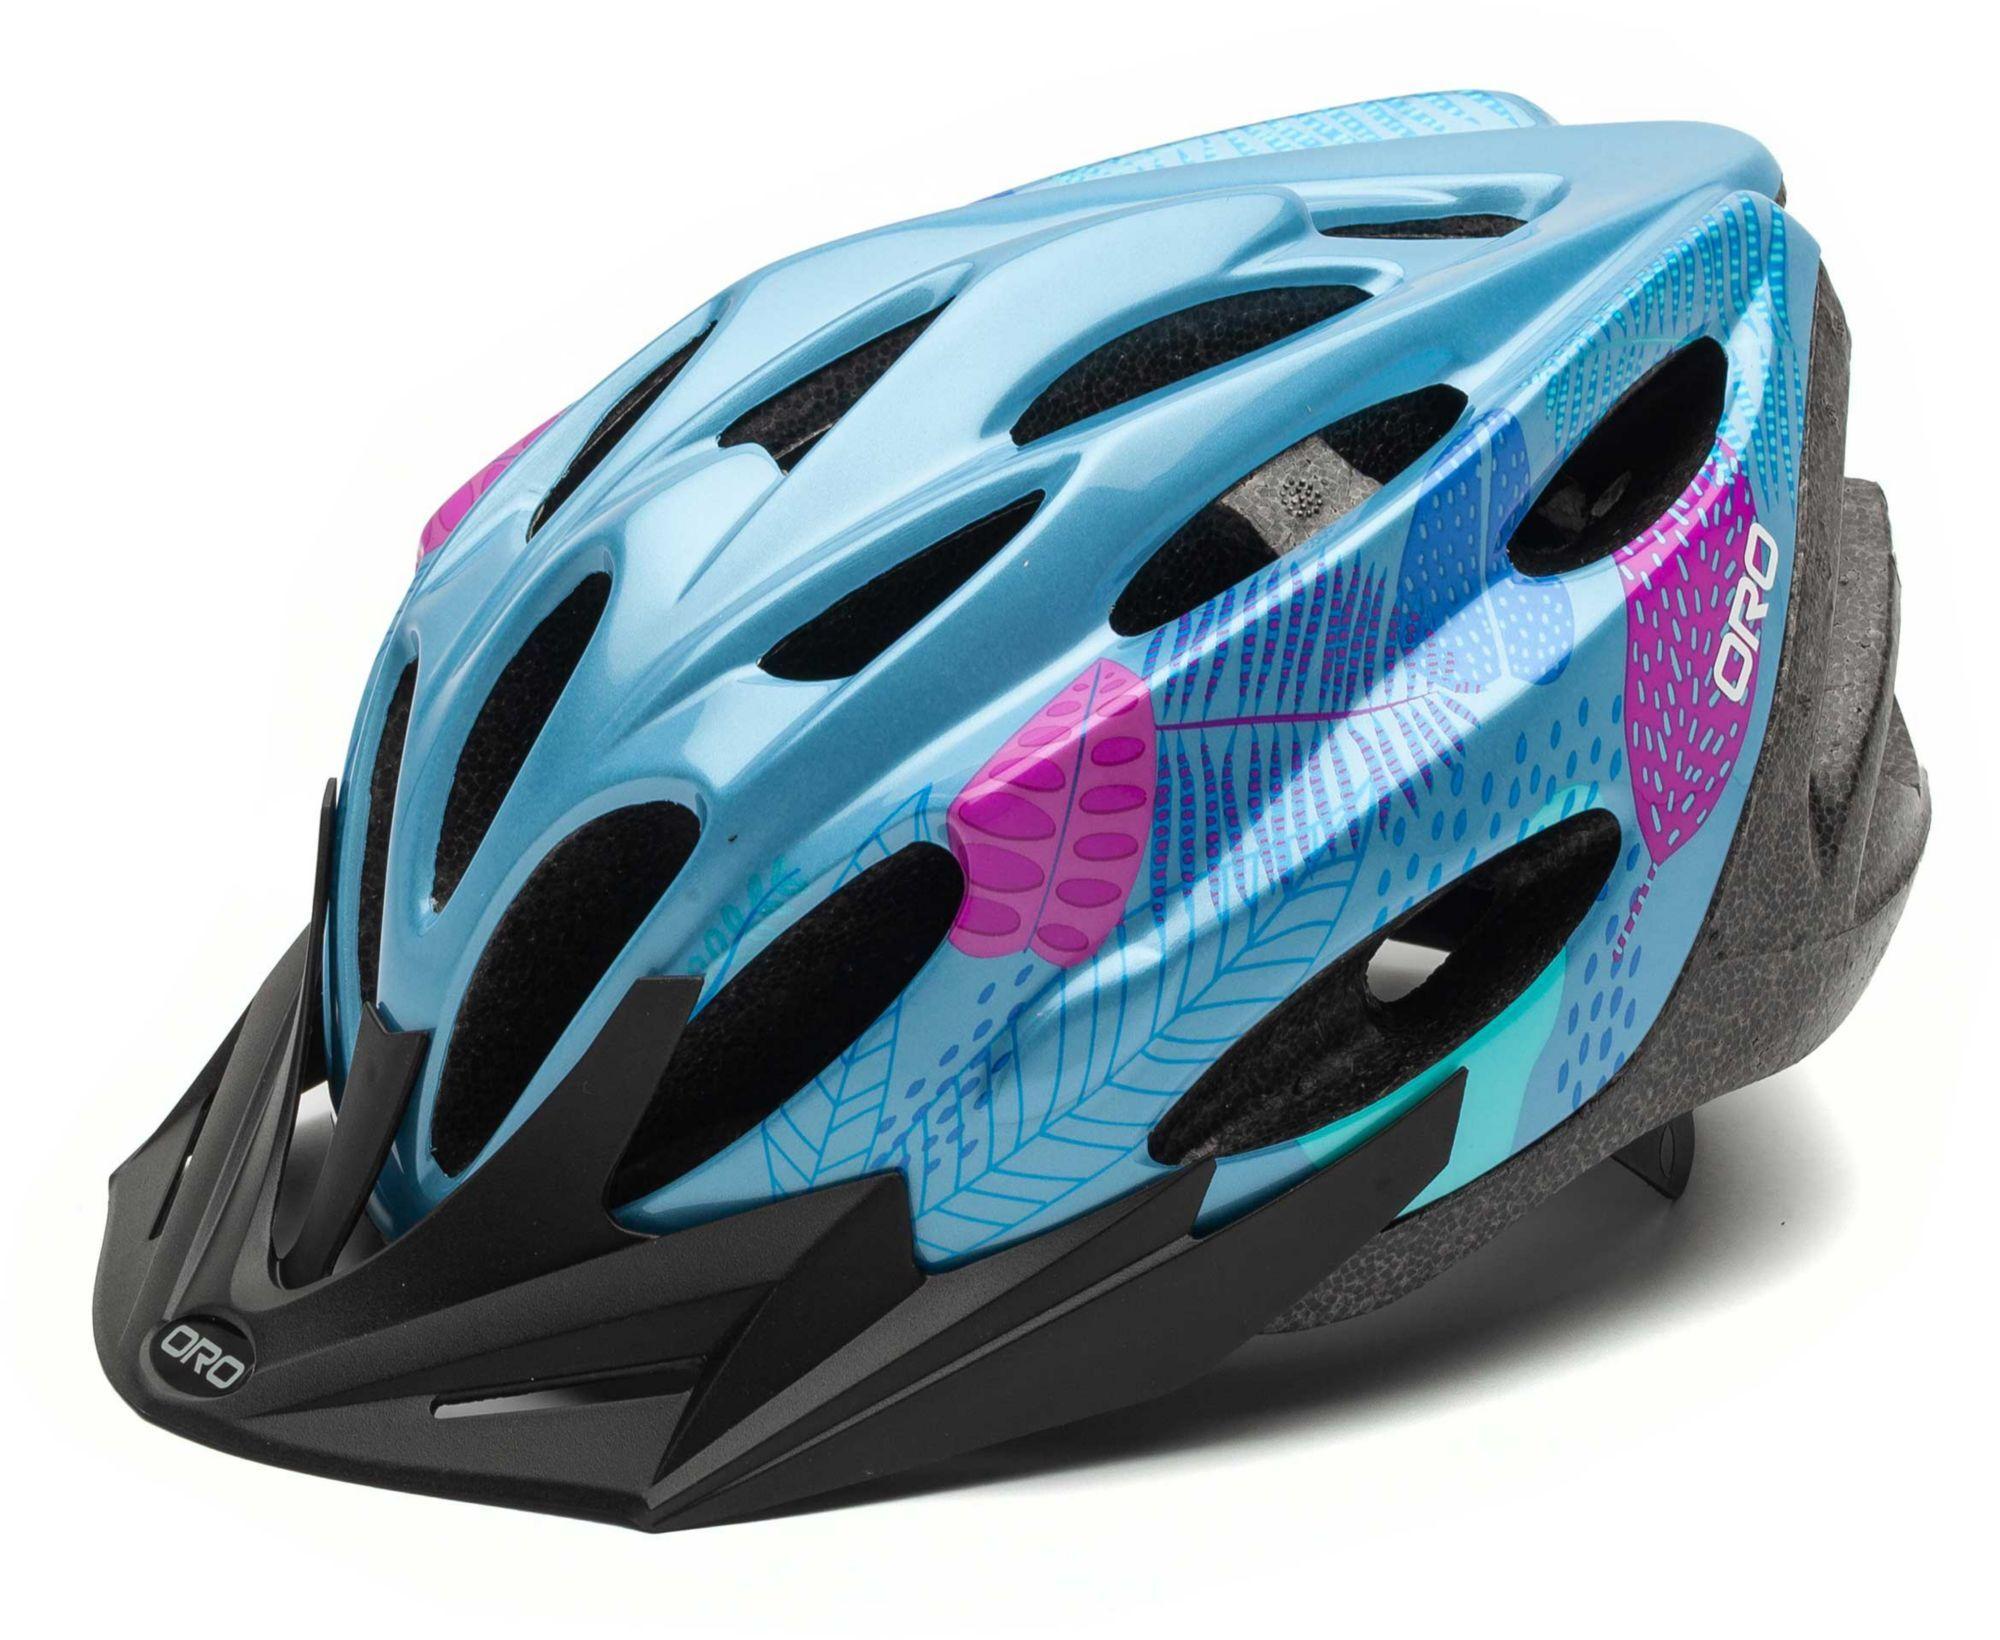 ORO Kids' Cheer Bike Helmet, Girls', No Size, Blue